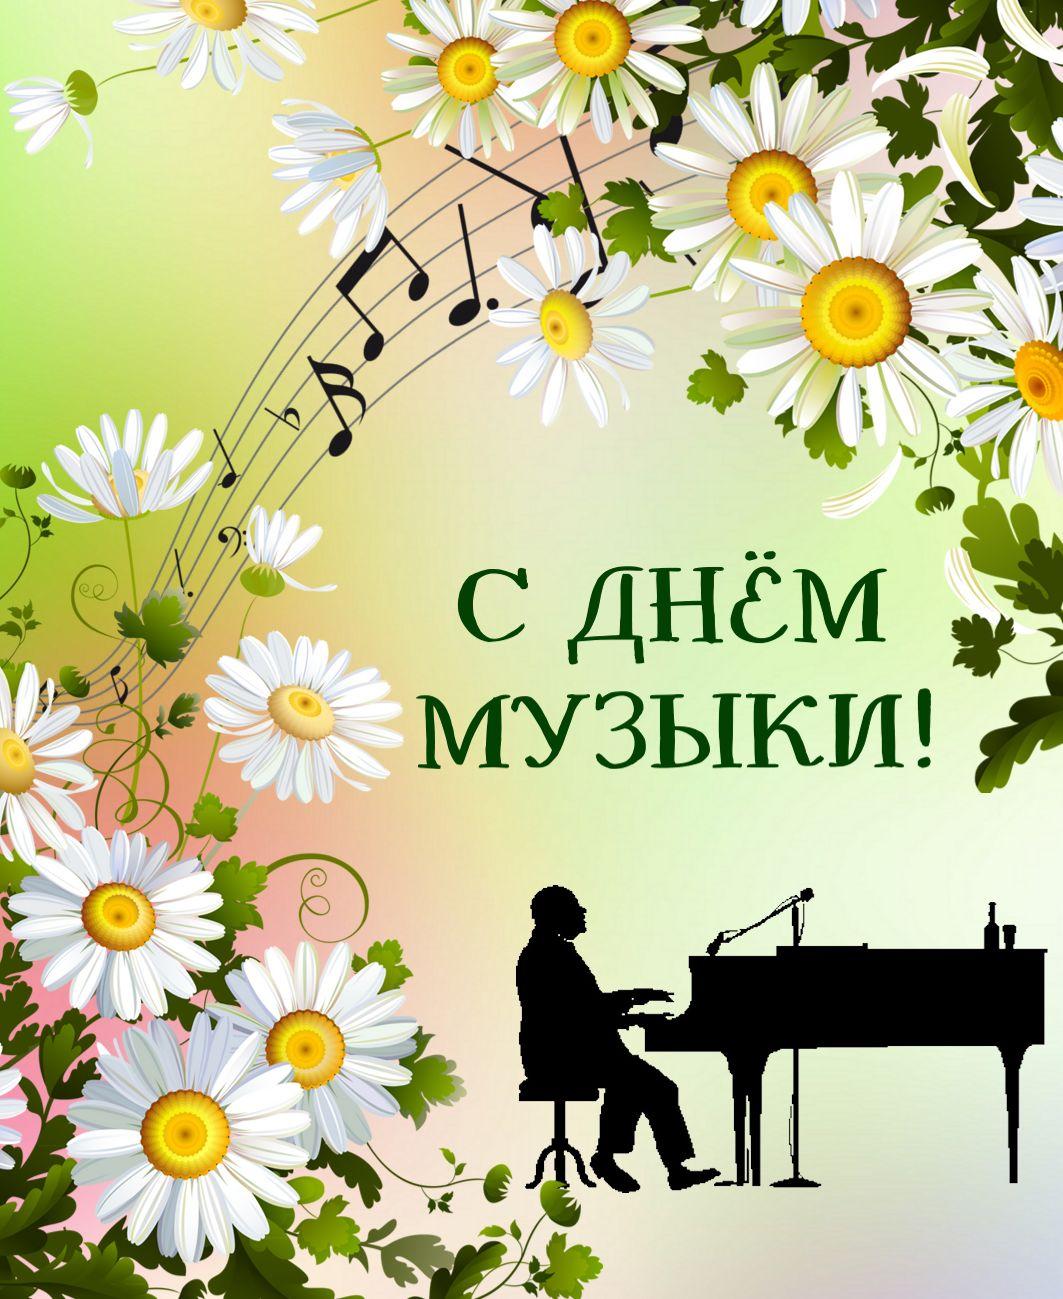 открытка с днем музыки - силуэт музыканта на фоне ромашек